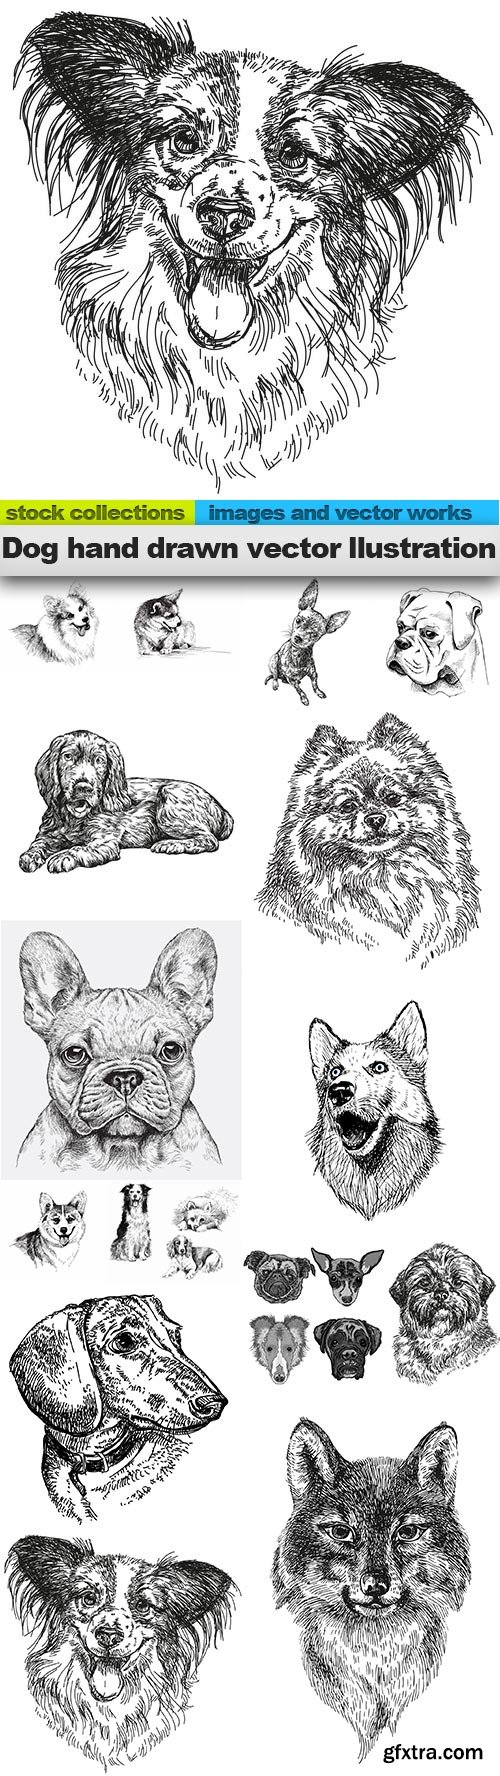 Dog hand drawn vector llustration, 15 X EPS